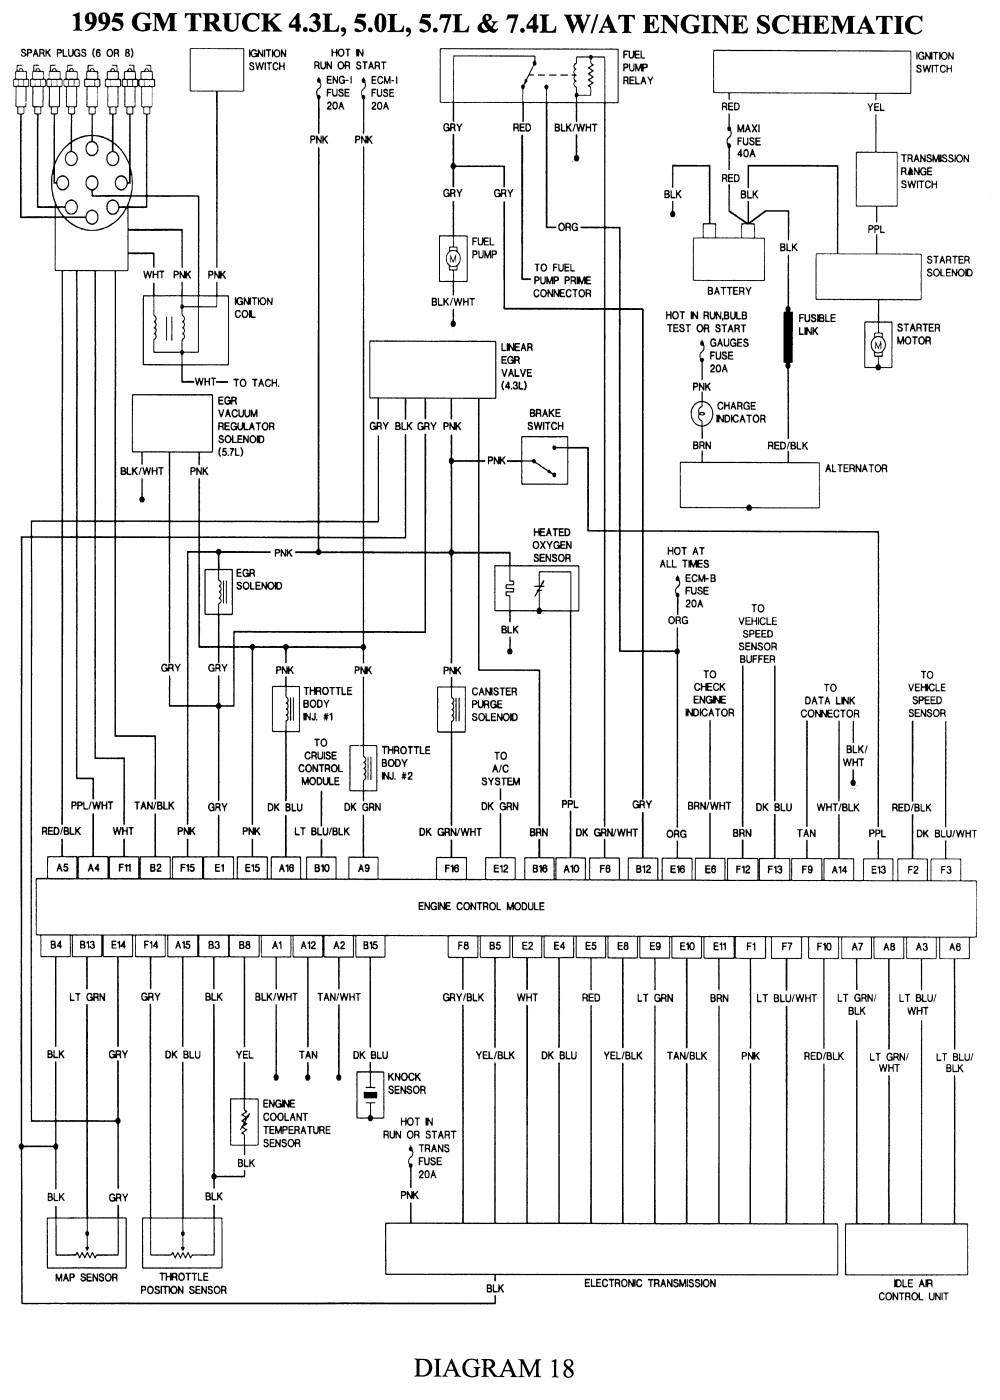 1995 Chevrolet Silverado Wiring Diagram Wire Center • Tail Light Wiring Diagram 1995 Chevy Truck